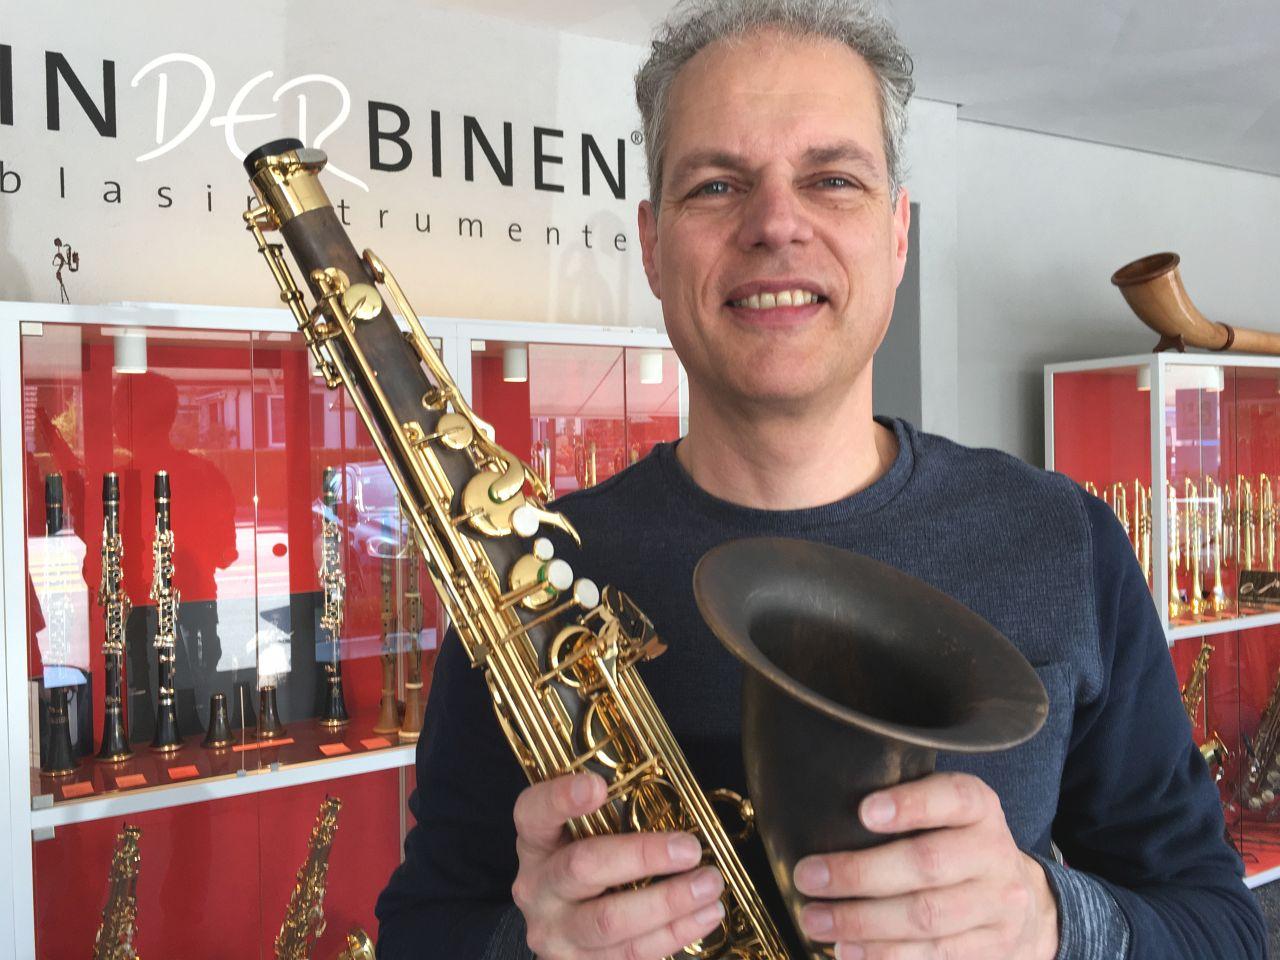 inderbinen-musicians-04